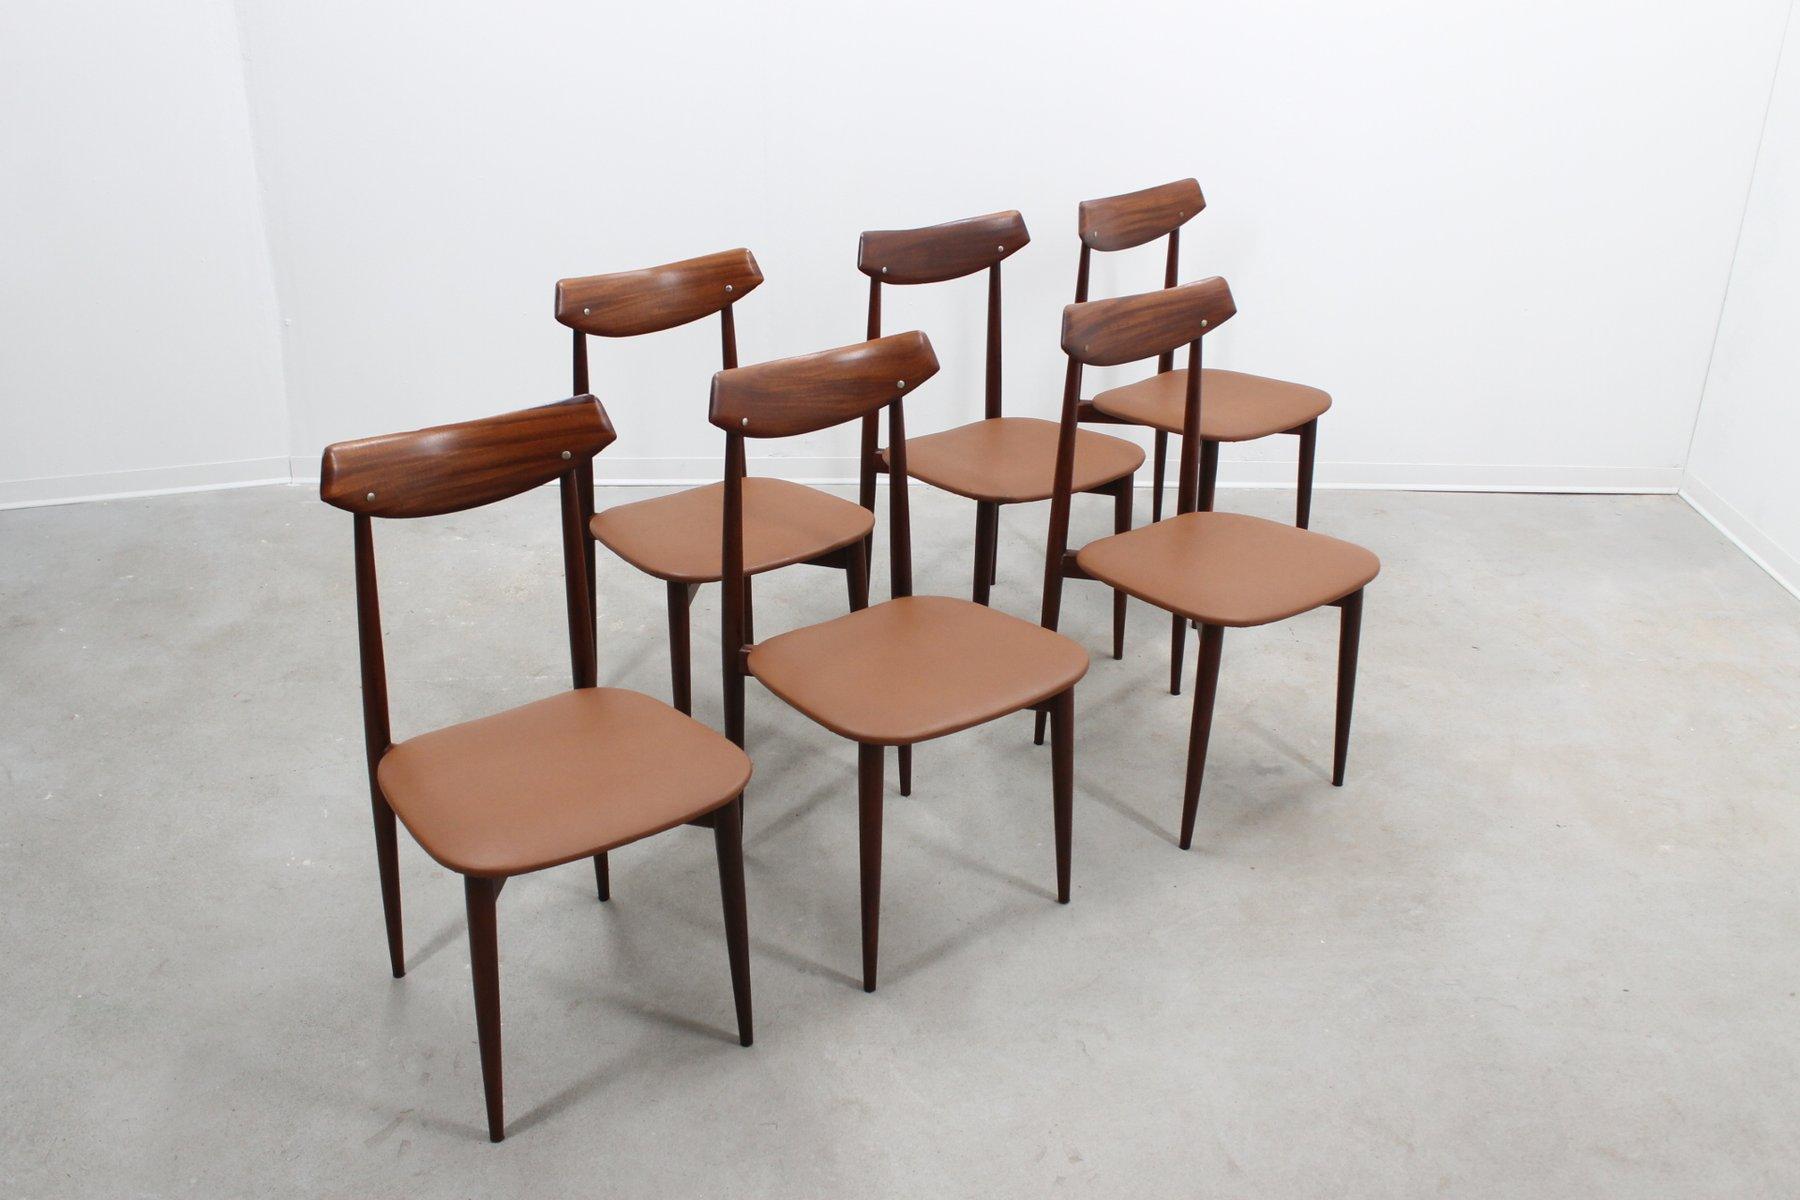 d nische moderne mid century st hle 6er set bei pamono kaufen. Black Bedroom Furniture Sets. Home Design Ideas